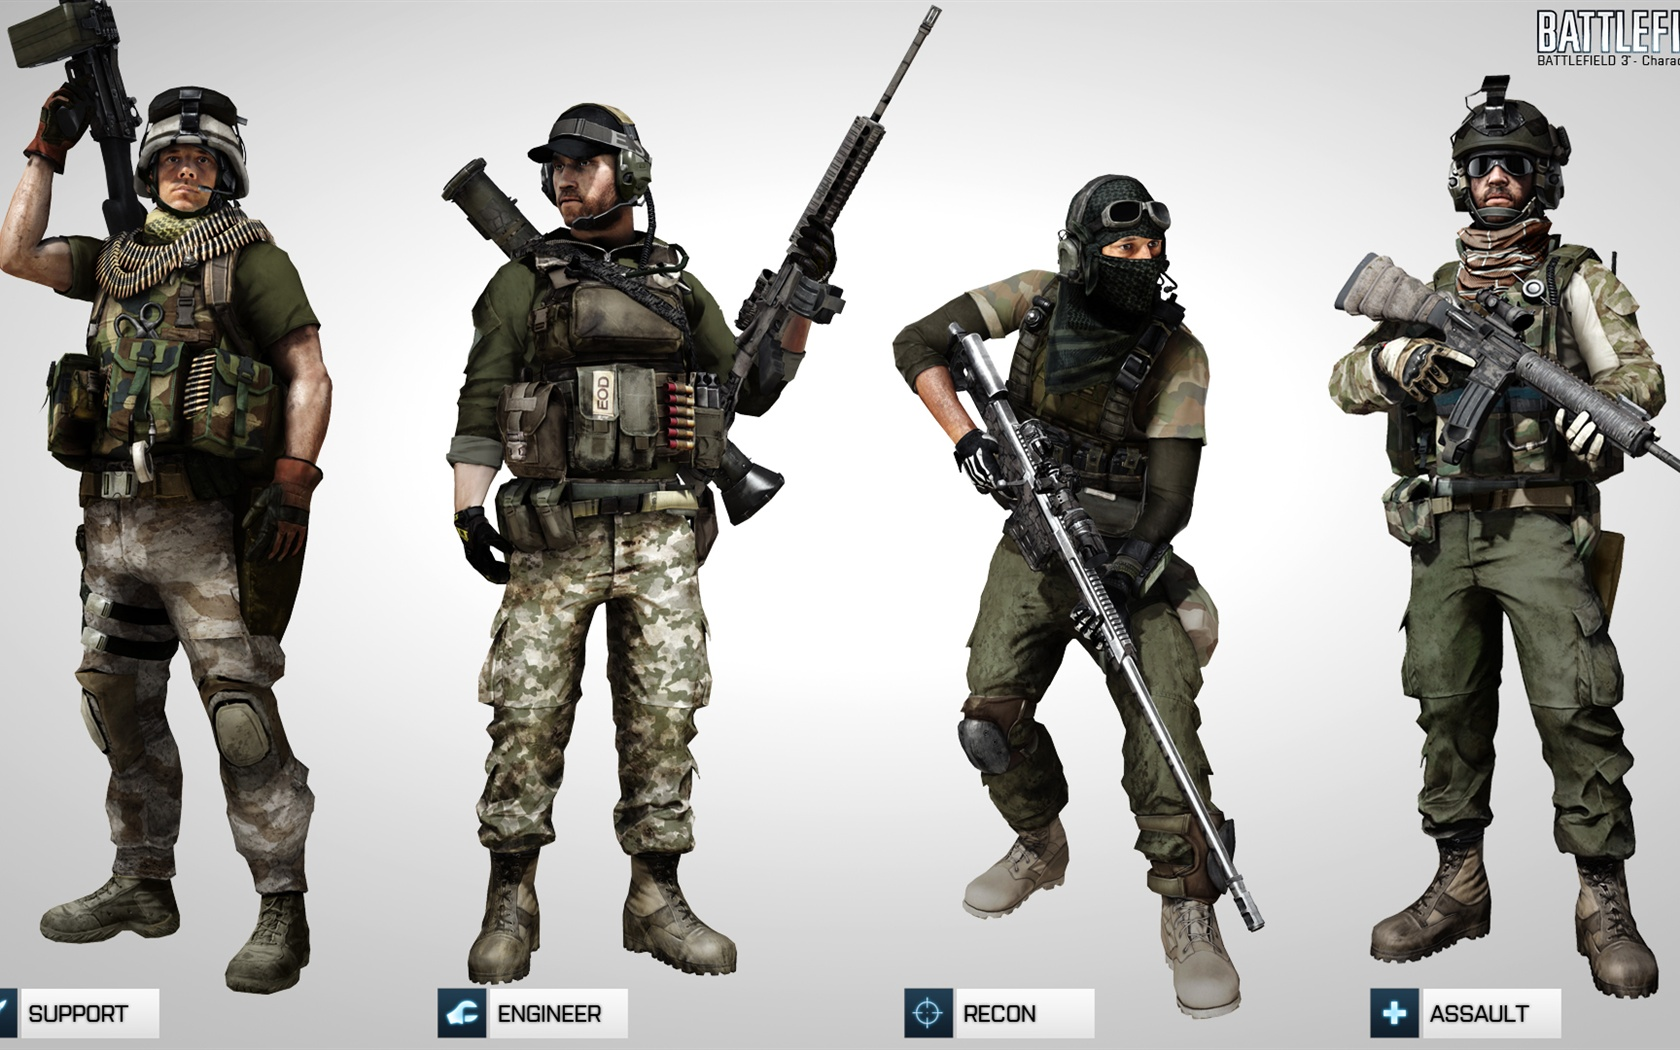 Battlefield 3 Multiplayer game 640x960 iPhone 44S wallpaper 1680x1050